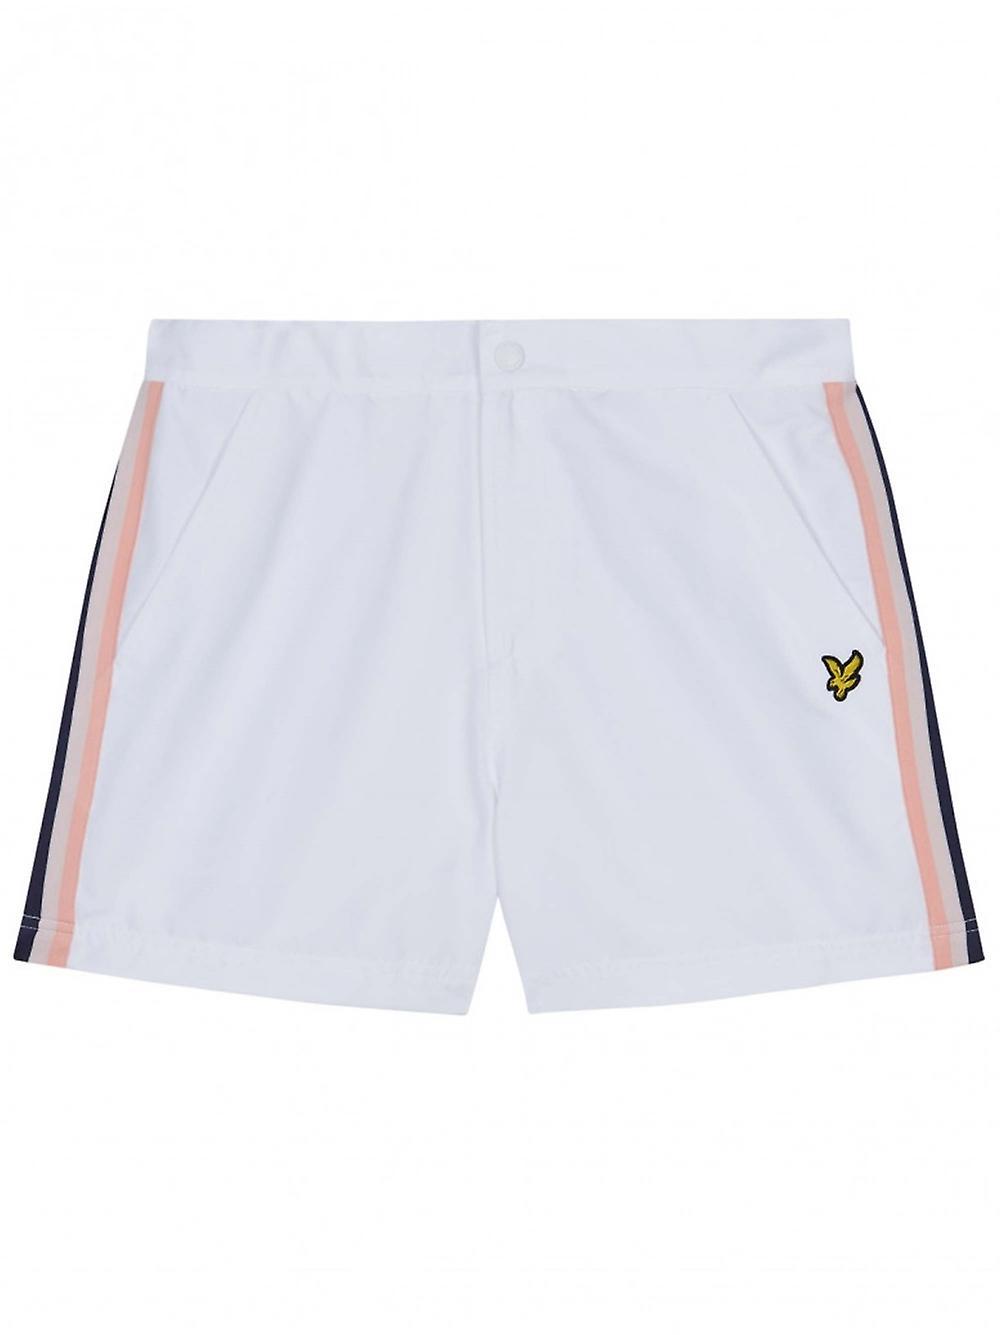 Lyle & Scott Lyle & Scott blanc Side Stripe nagent Shorts